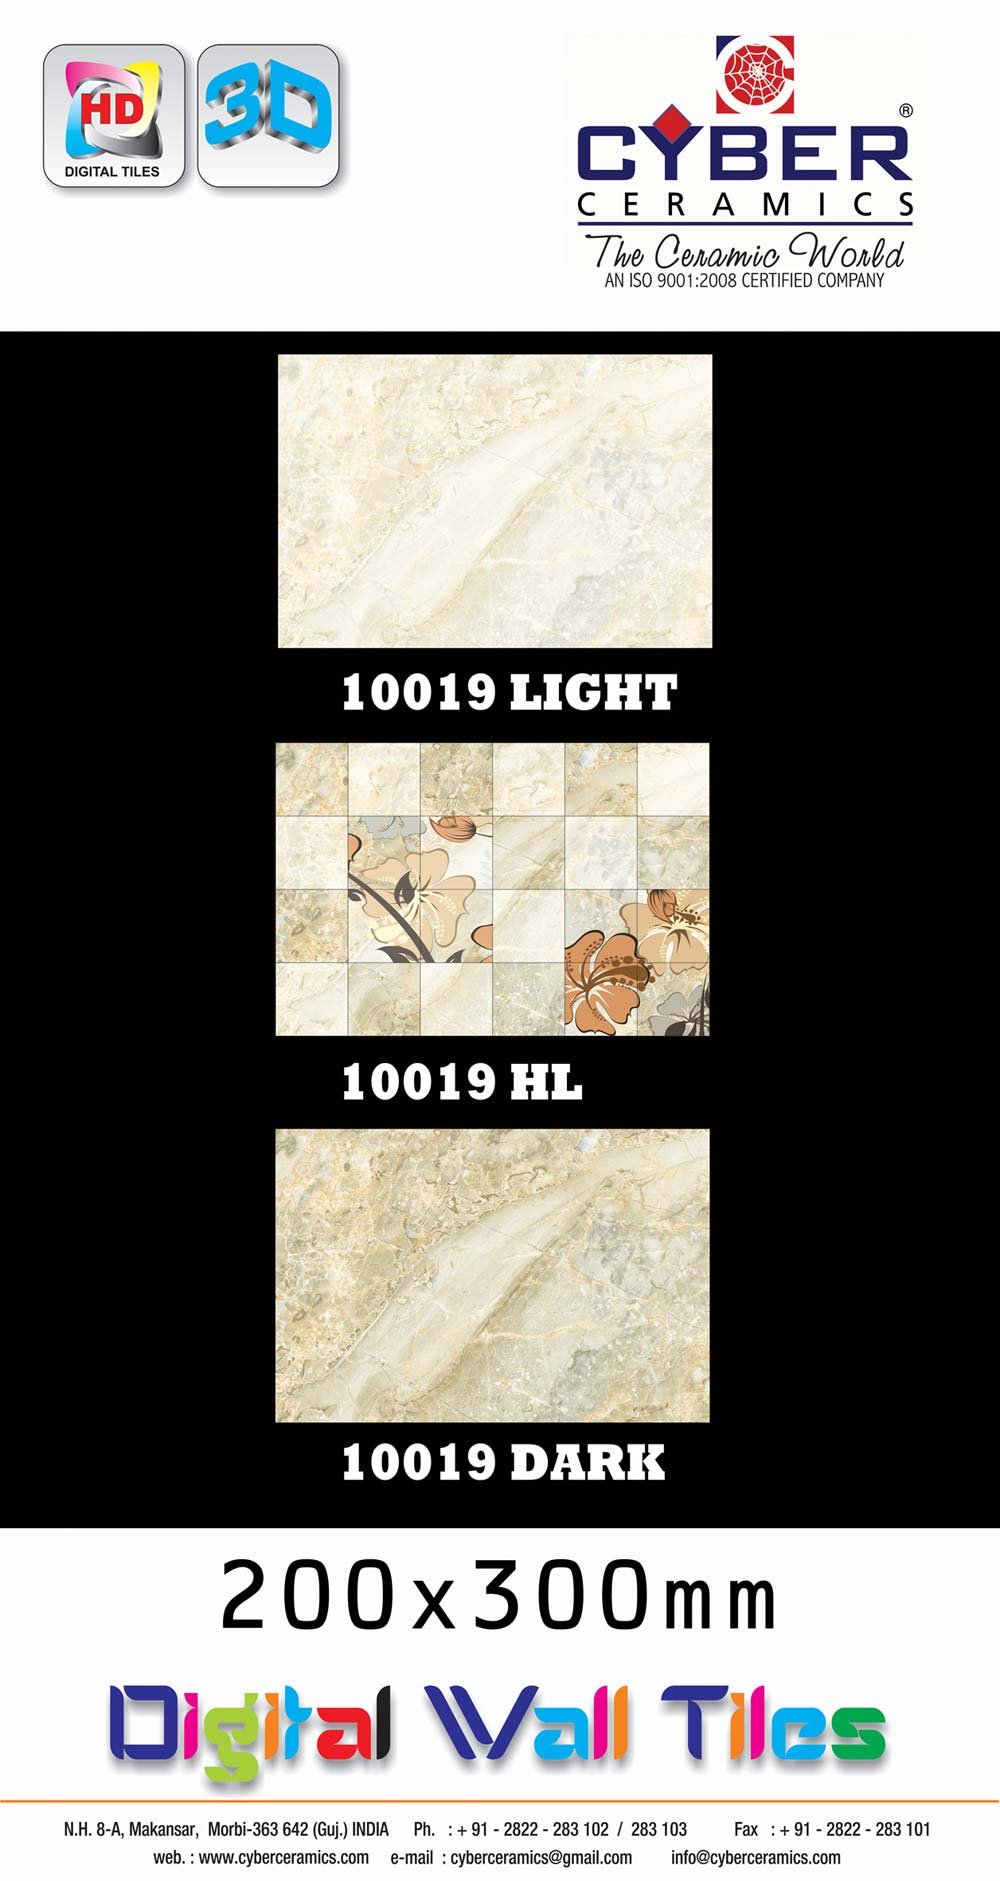 Ceramic tiles making process gallery tile flooring design ideas ceramic tiles manufacturing process in india images tile ceramic tiles making process image collections tile flooring dailygadgetfo Images